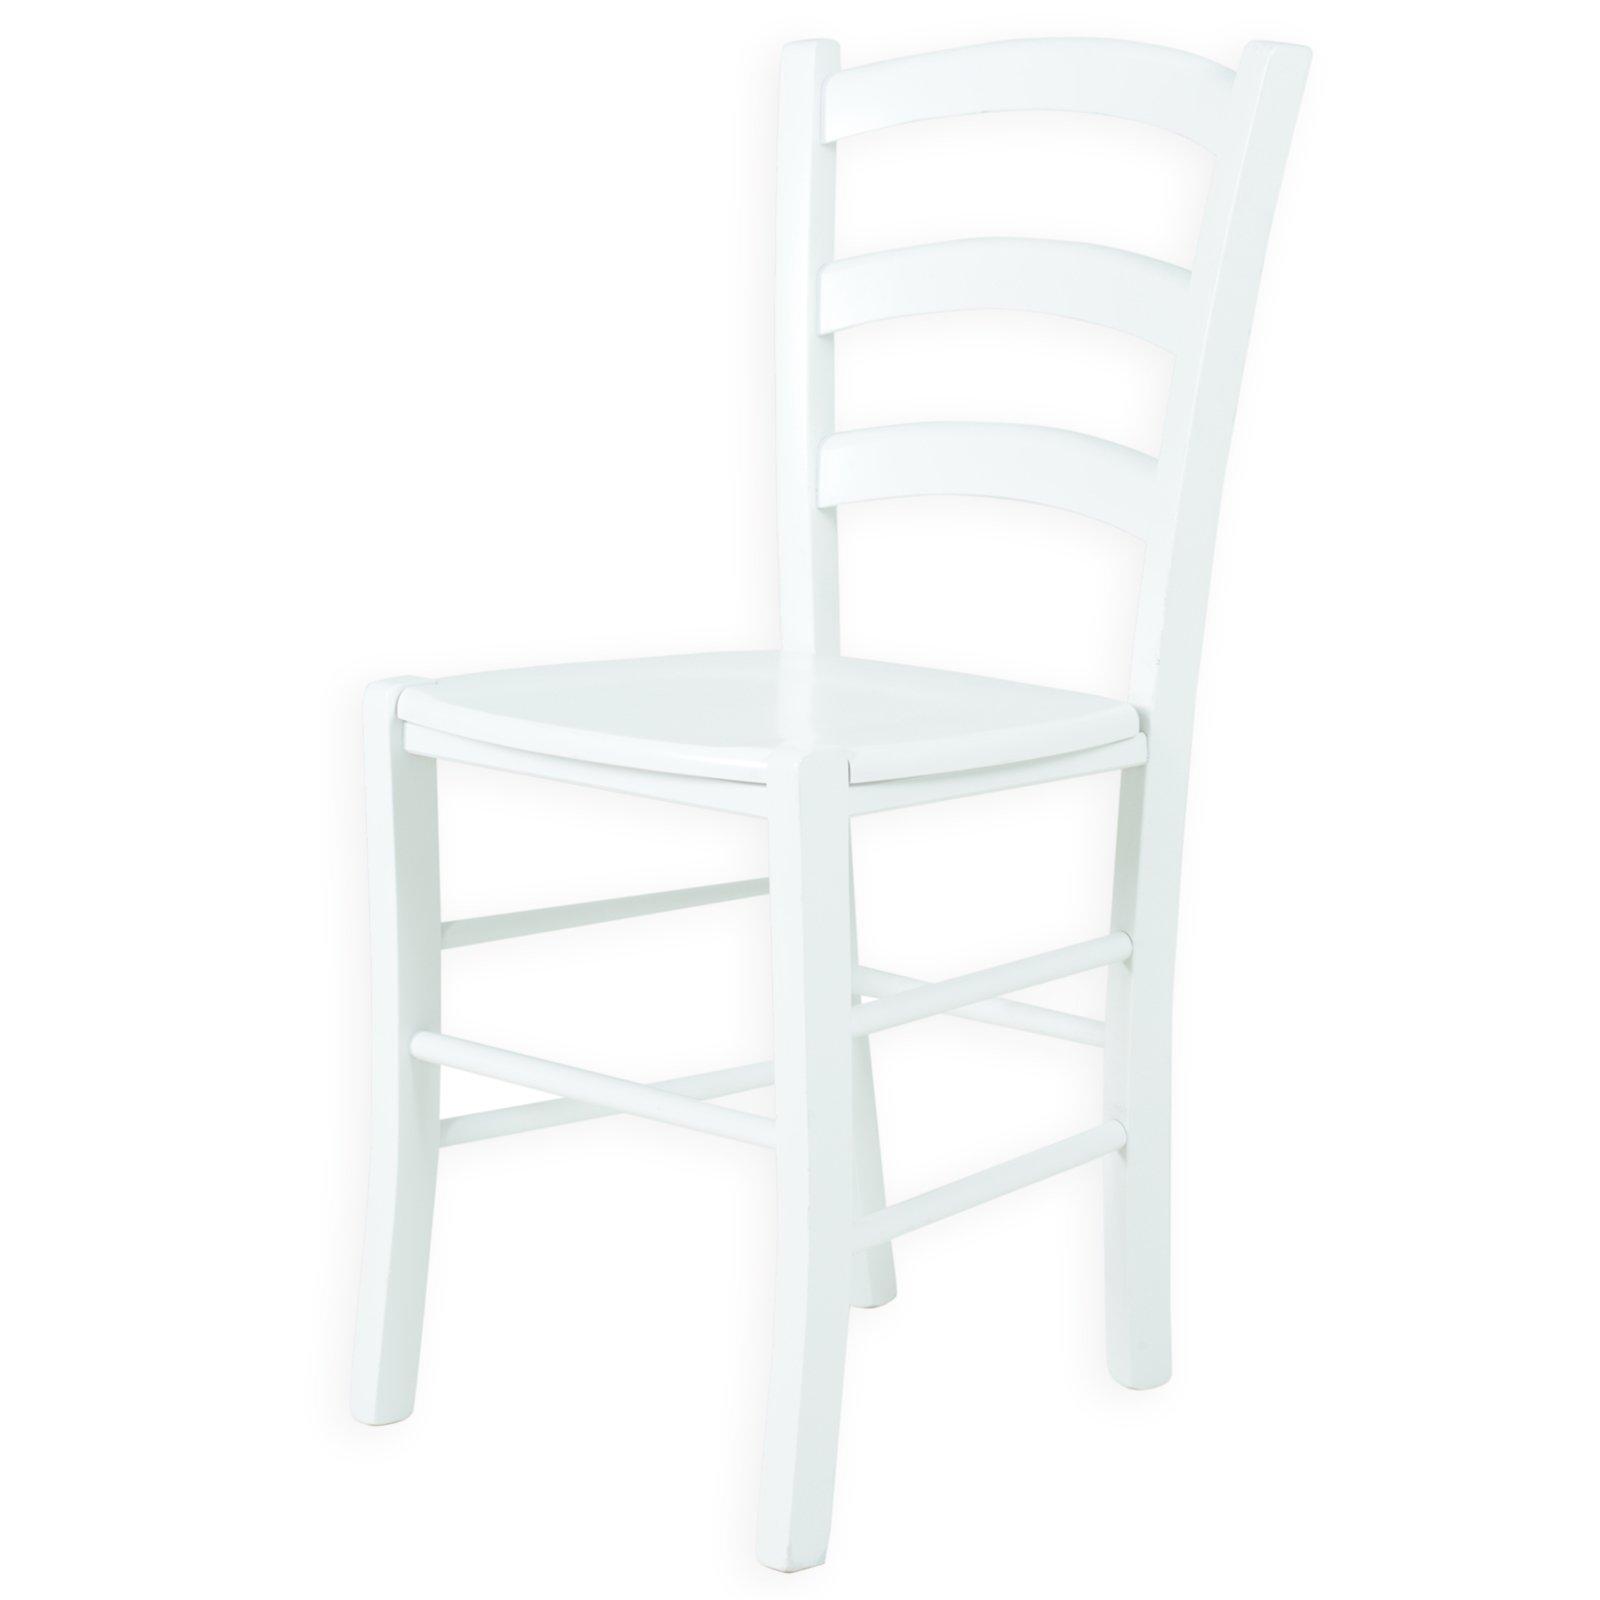 Holzstuhl Weiß holzstuhl sorrento i weiß massivholz geformter sitz